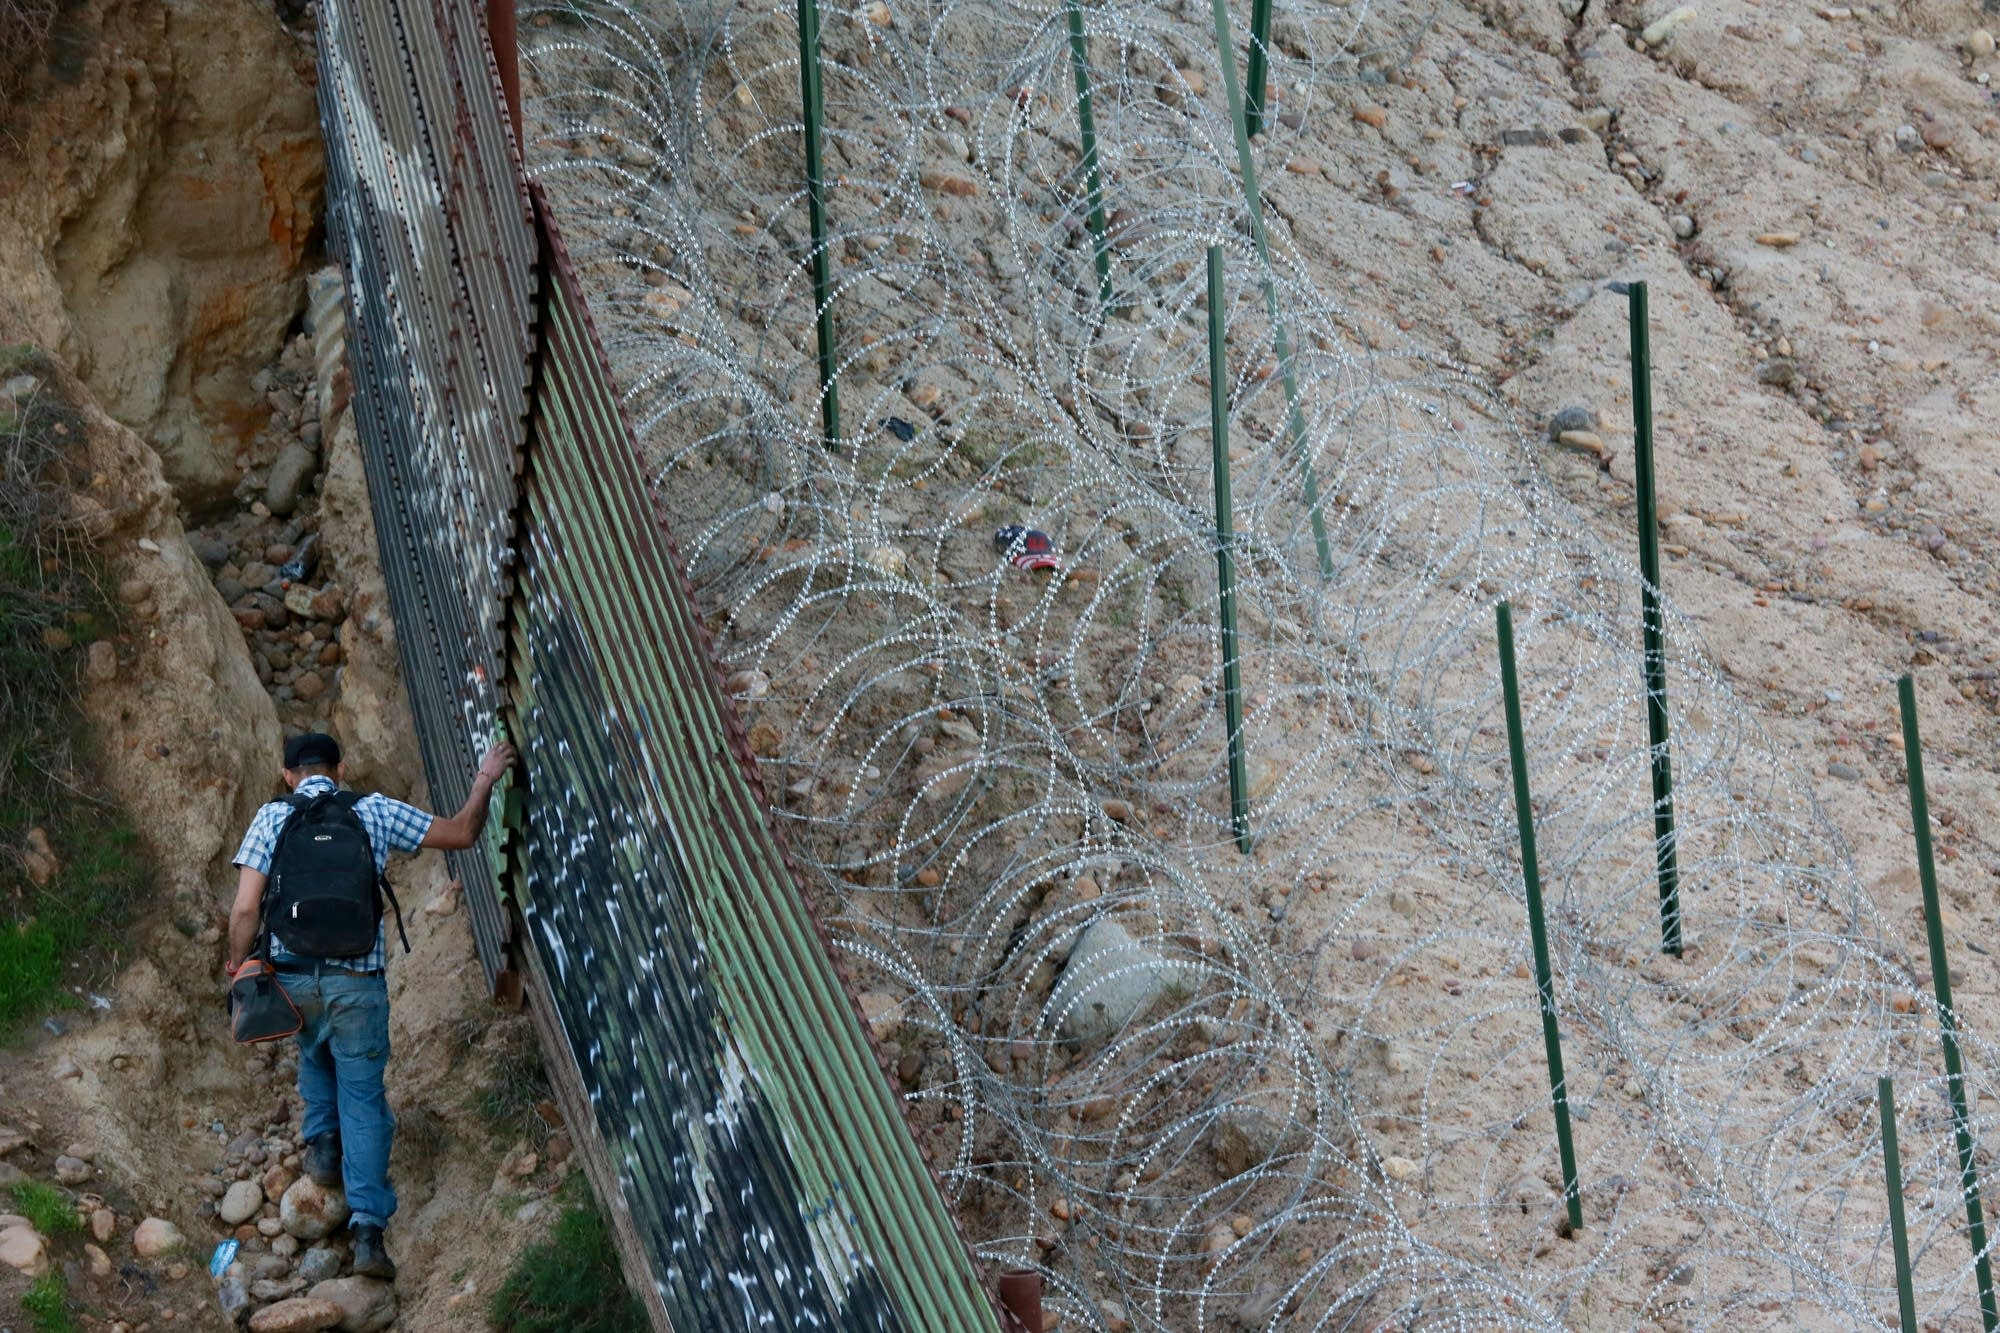 A man walks along the U.S.-Mexico border wall.